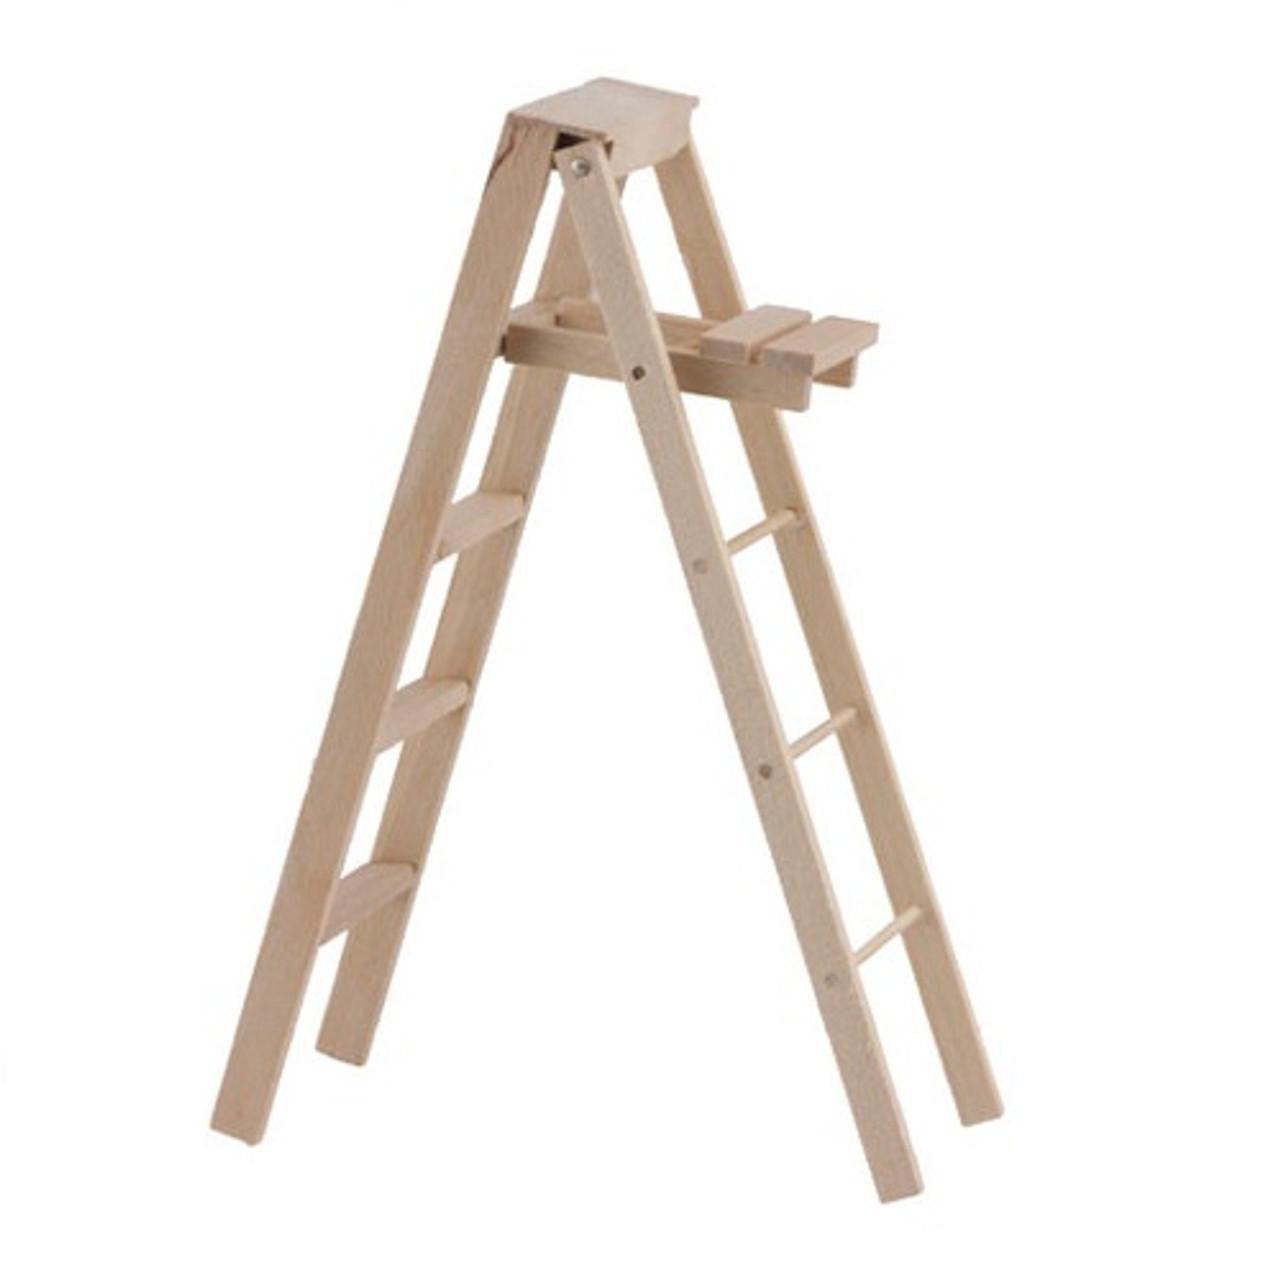 "5"" wooden folding stepladder"